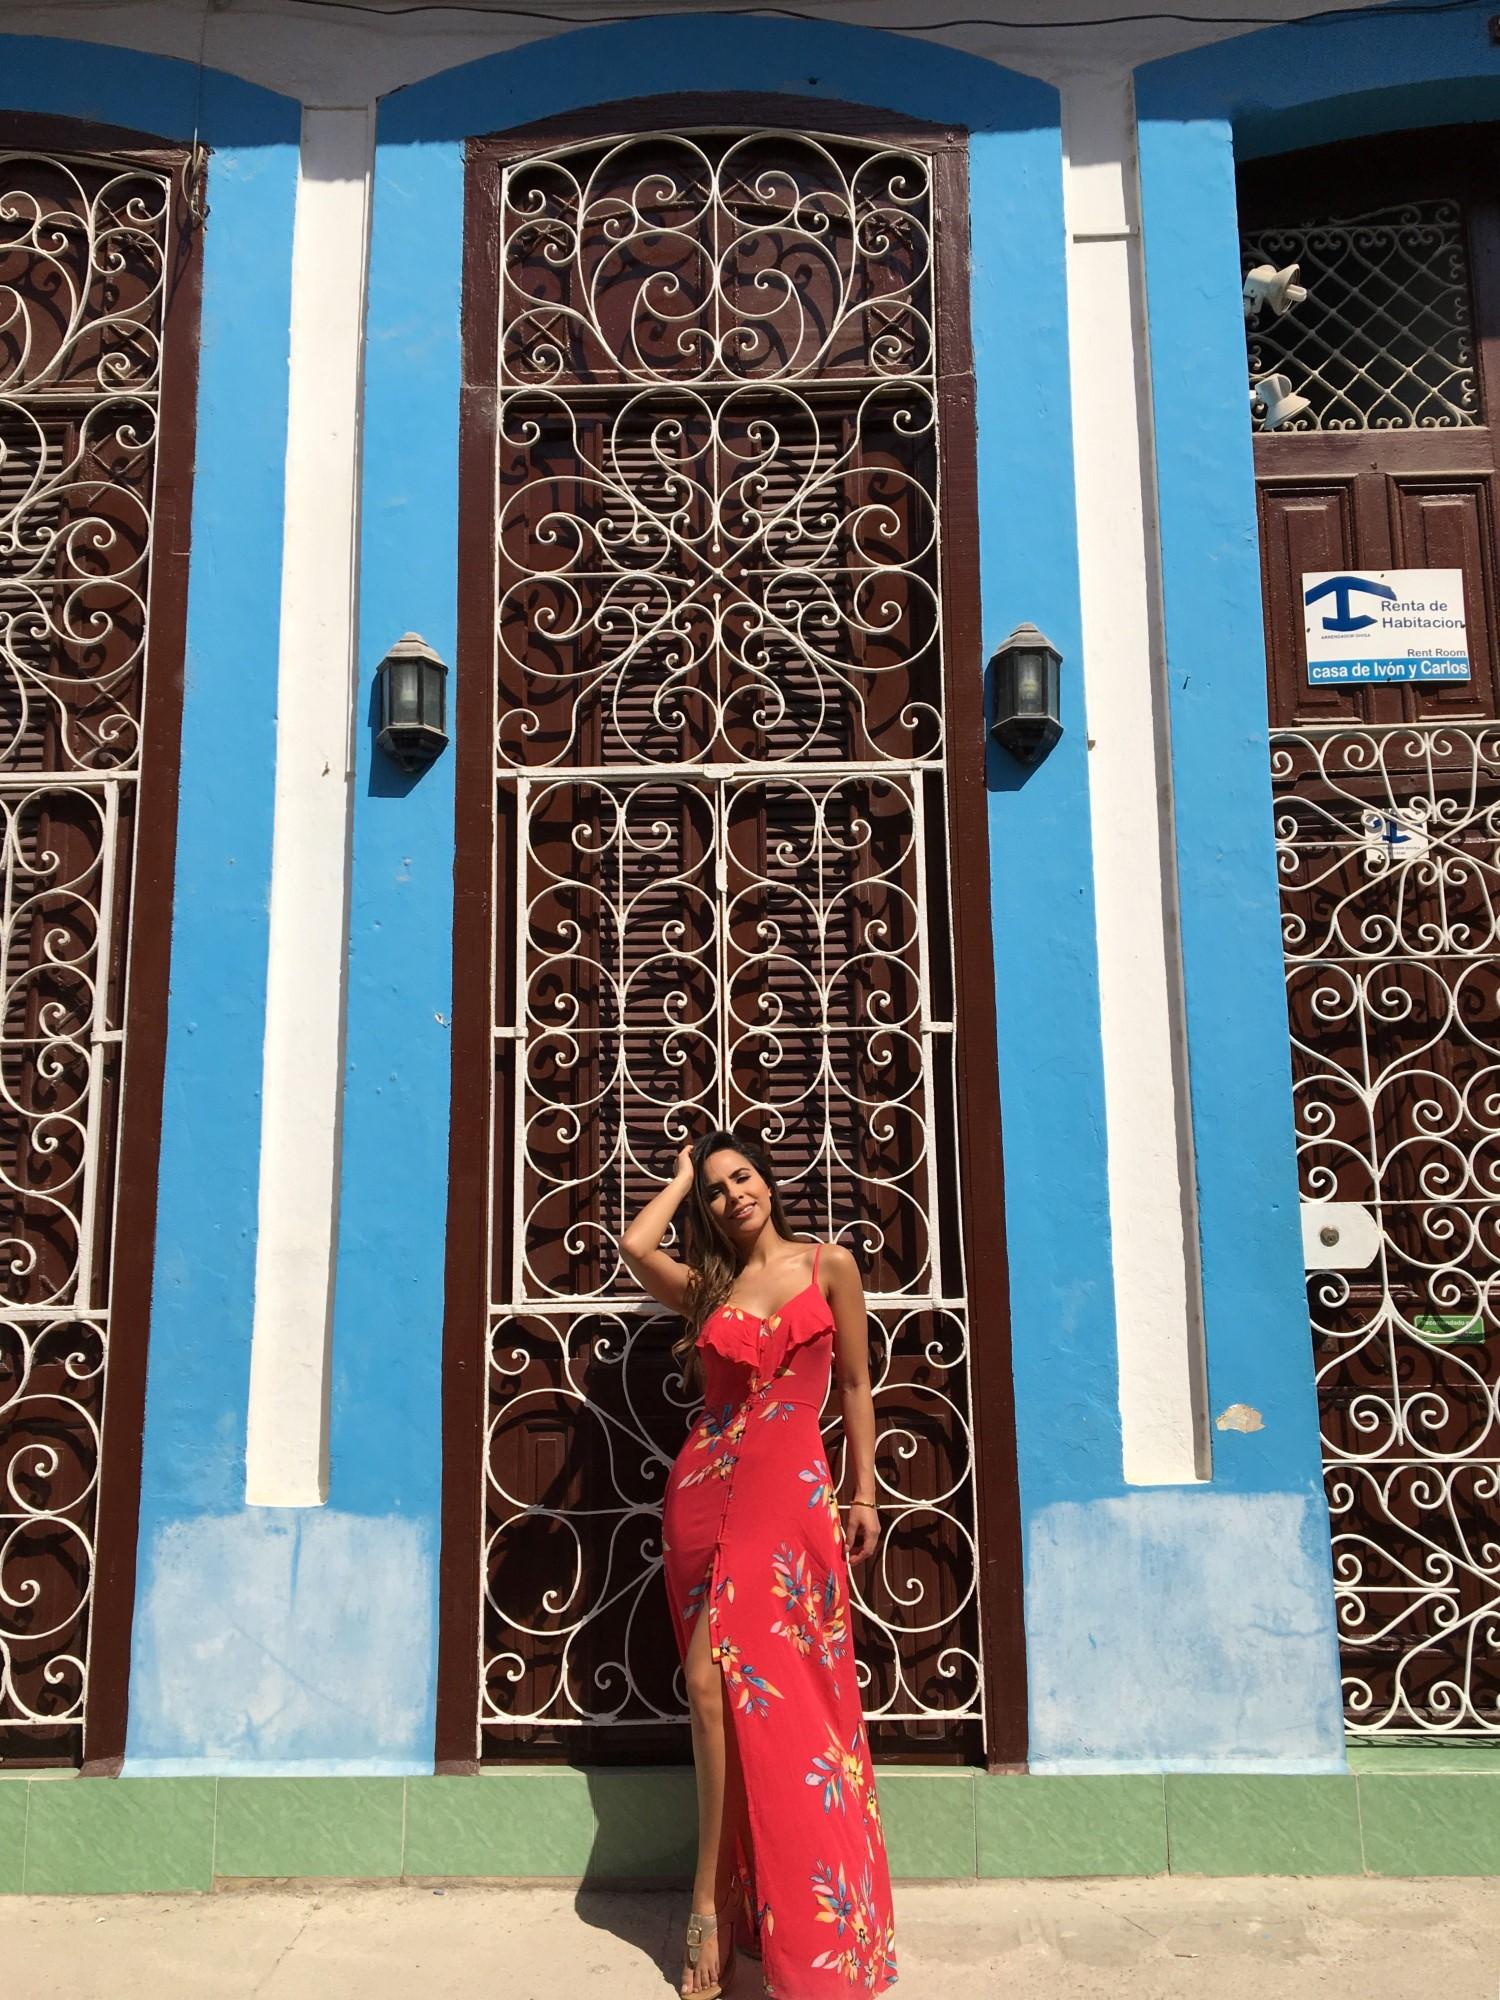 Lisa Morales, Traveling to Havana Cuba